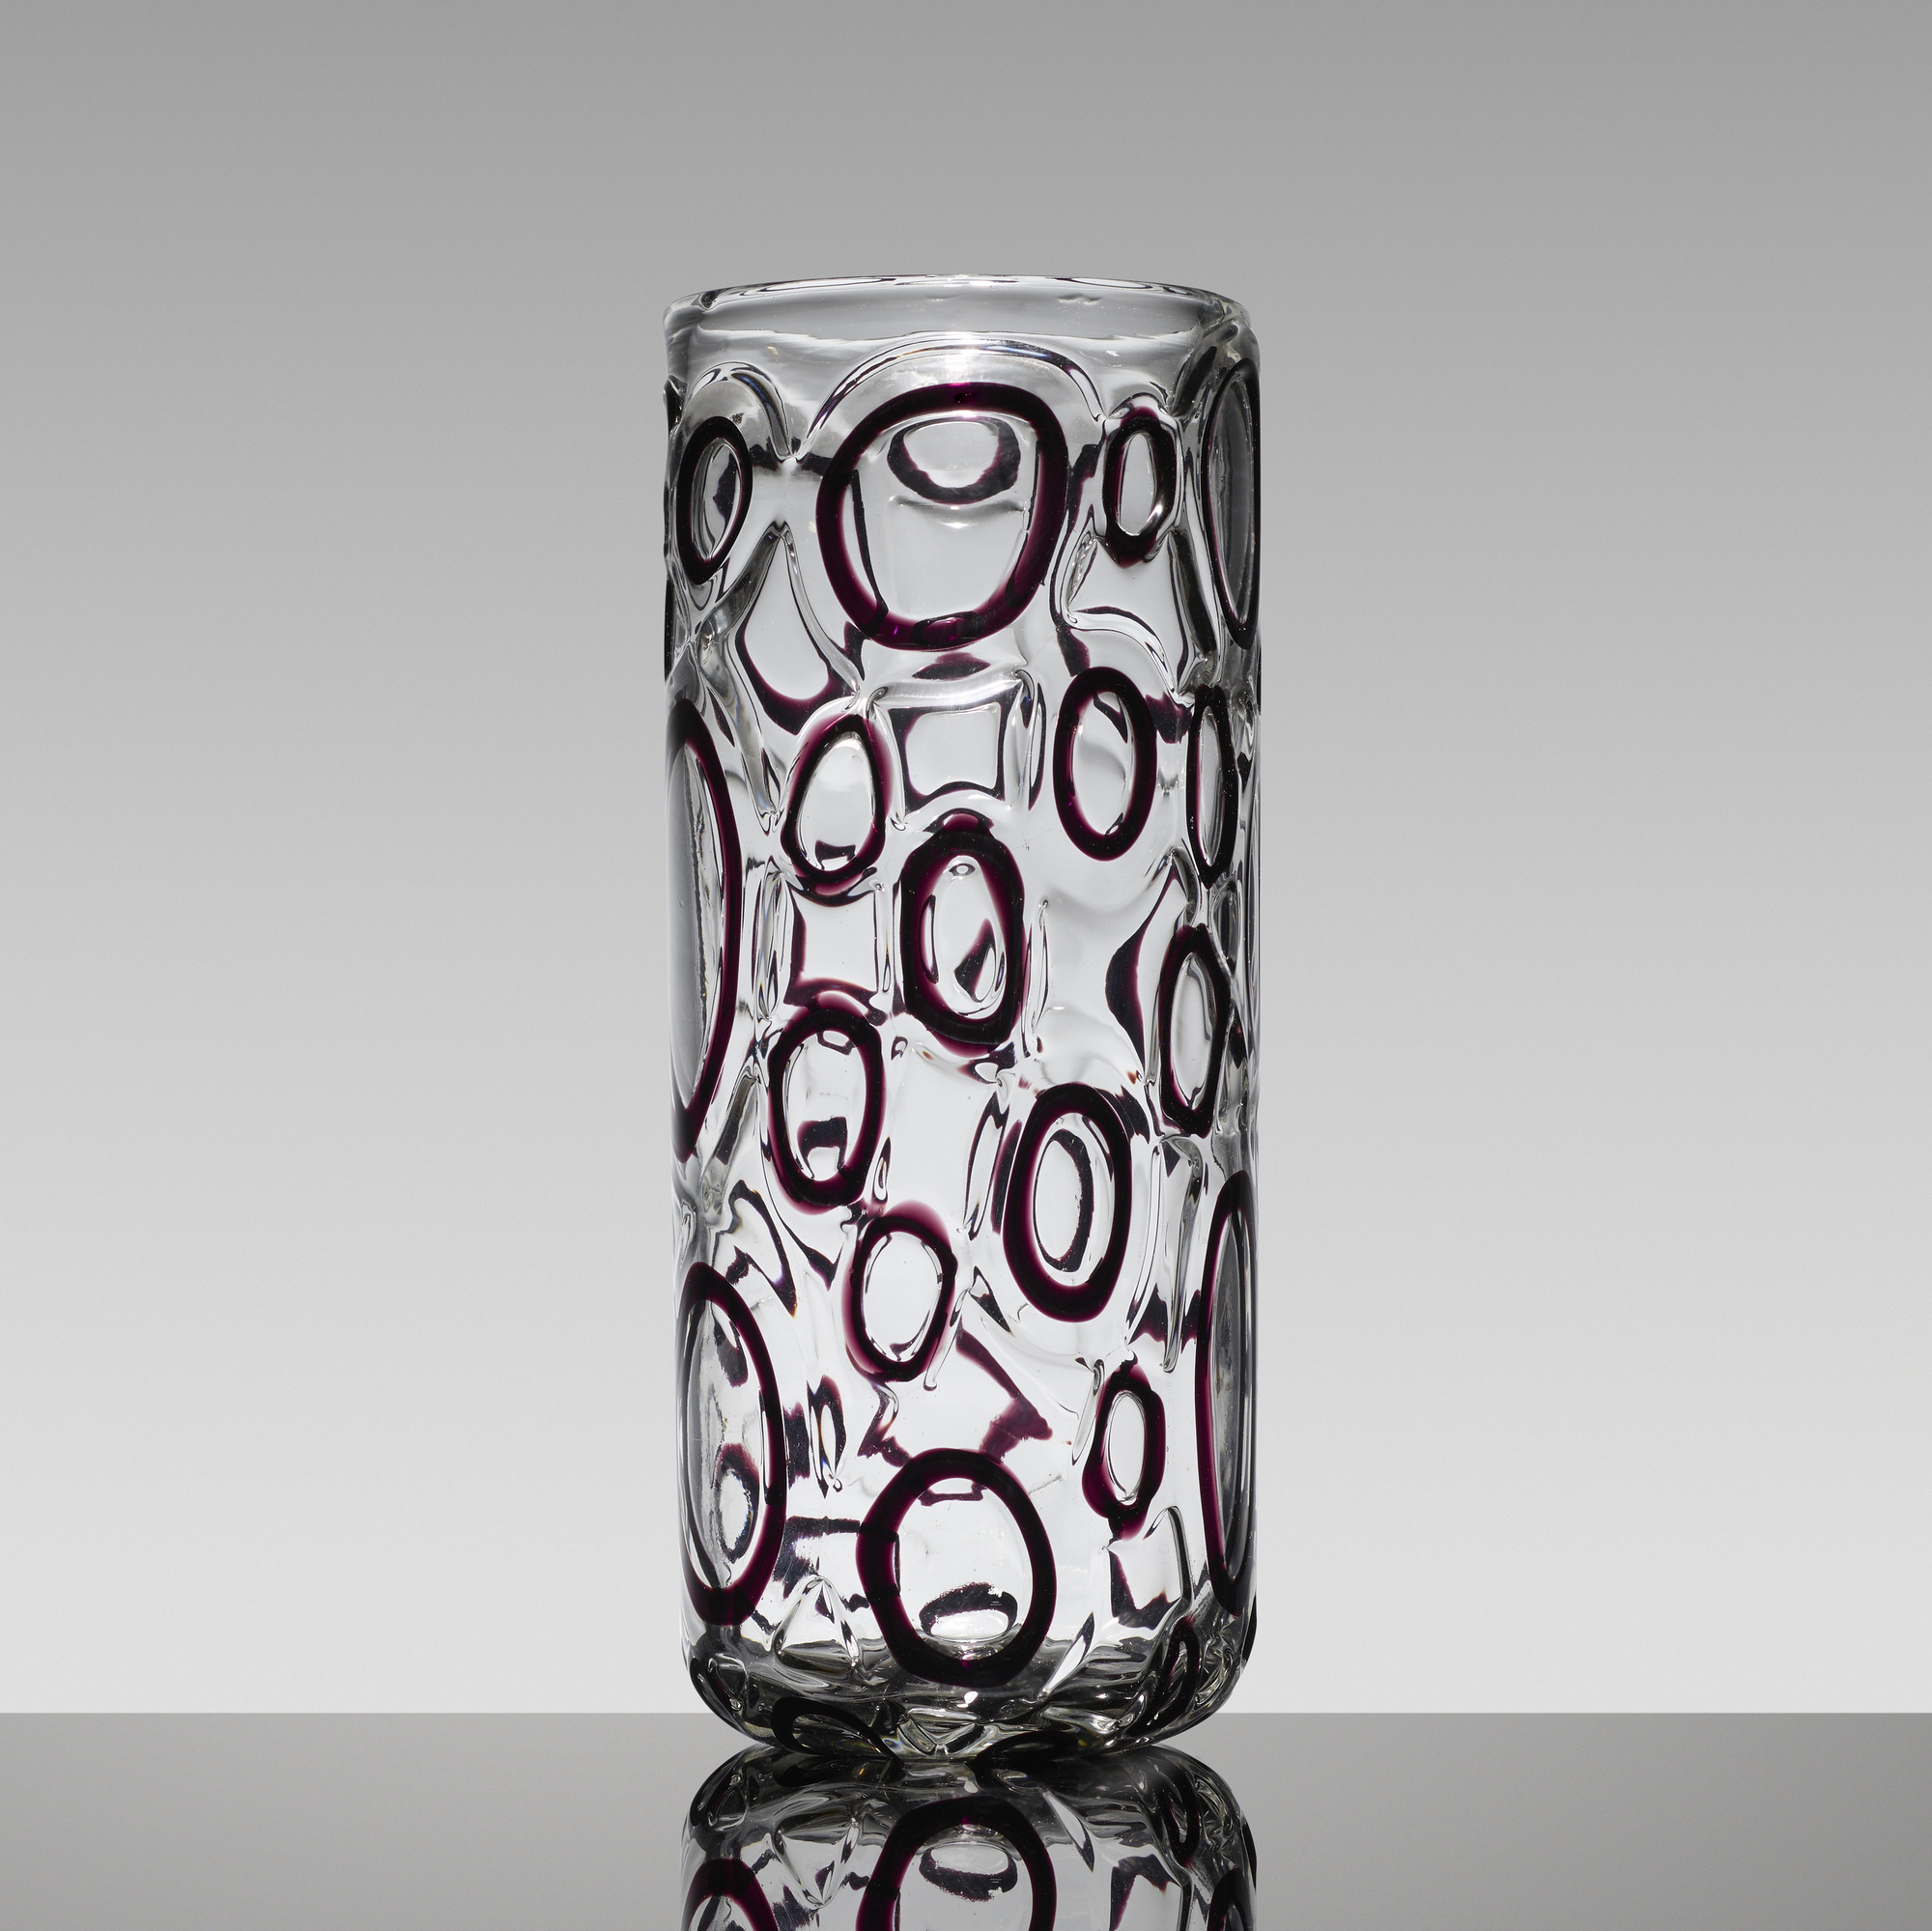 177: Ercole Barovier / Sidereo vase (1 of 2)